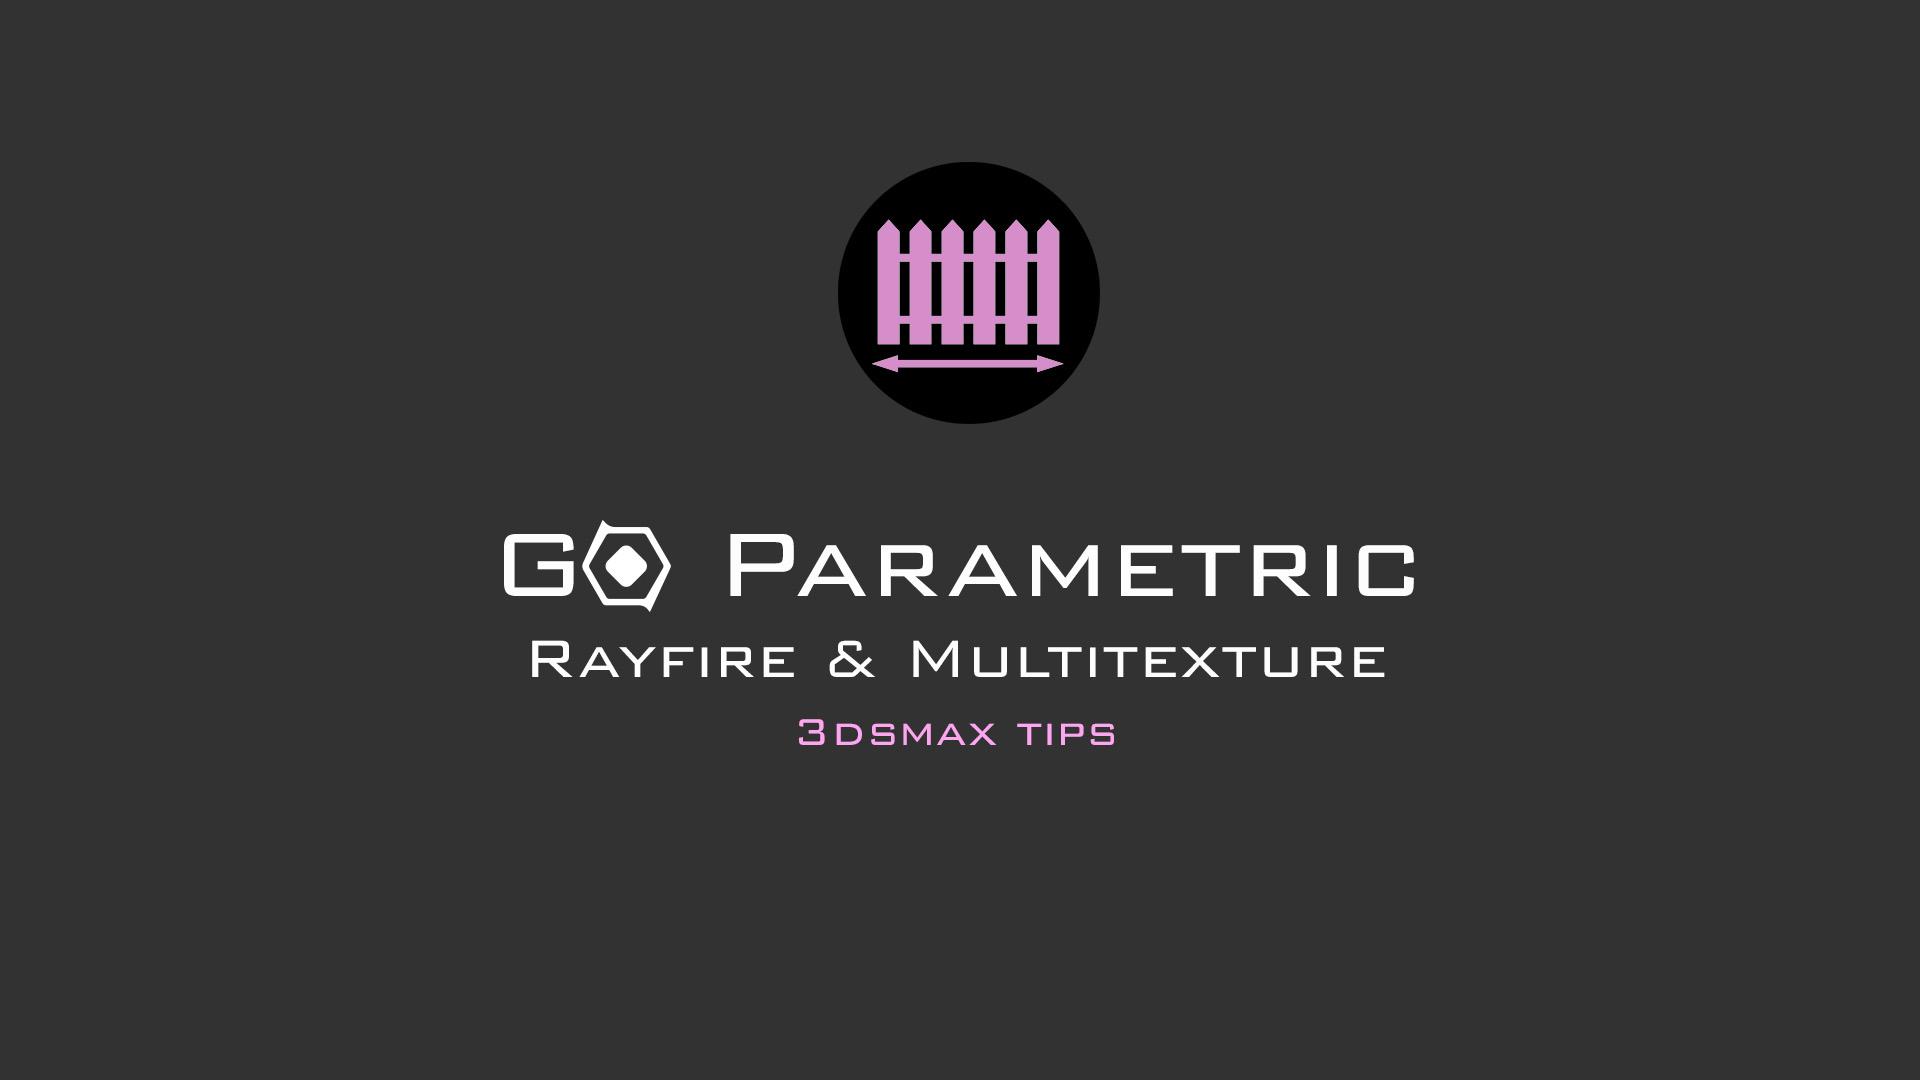 Go Parametric_Rayfire_Multitexture.jpg